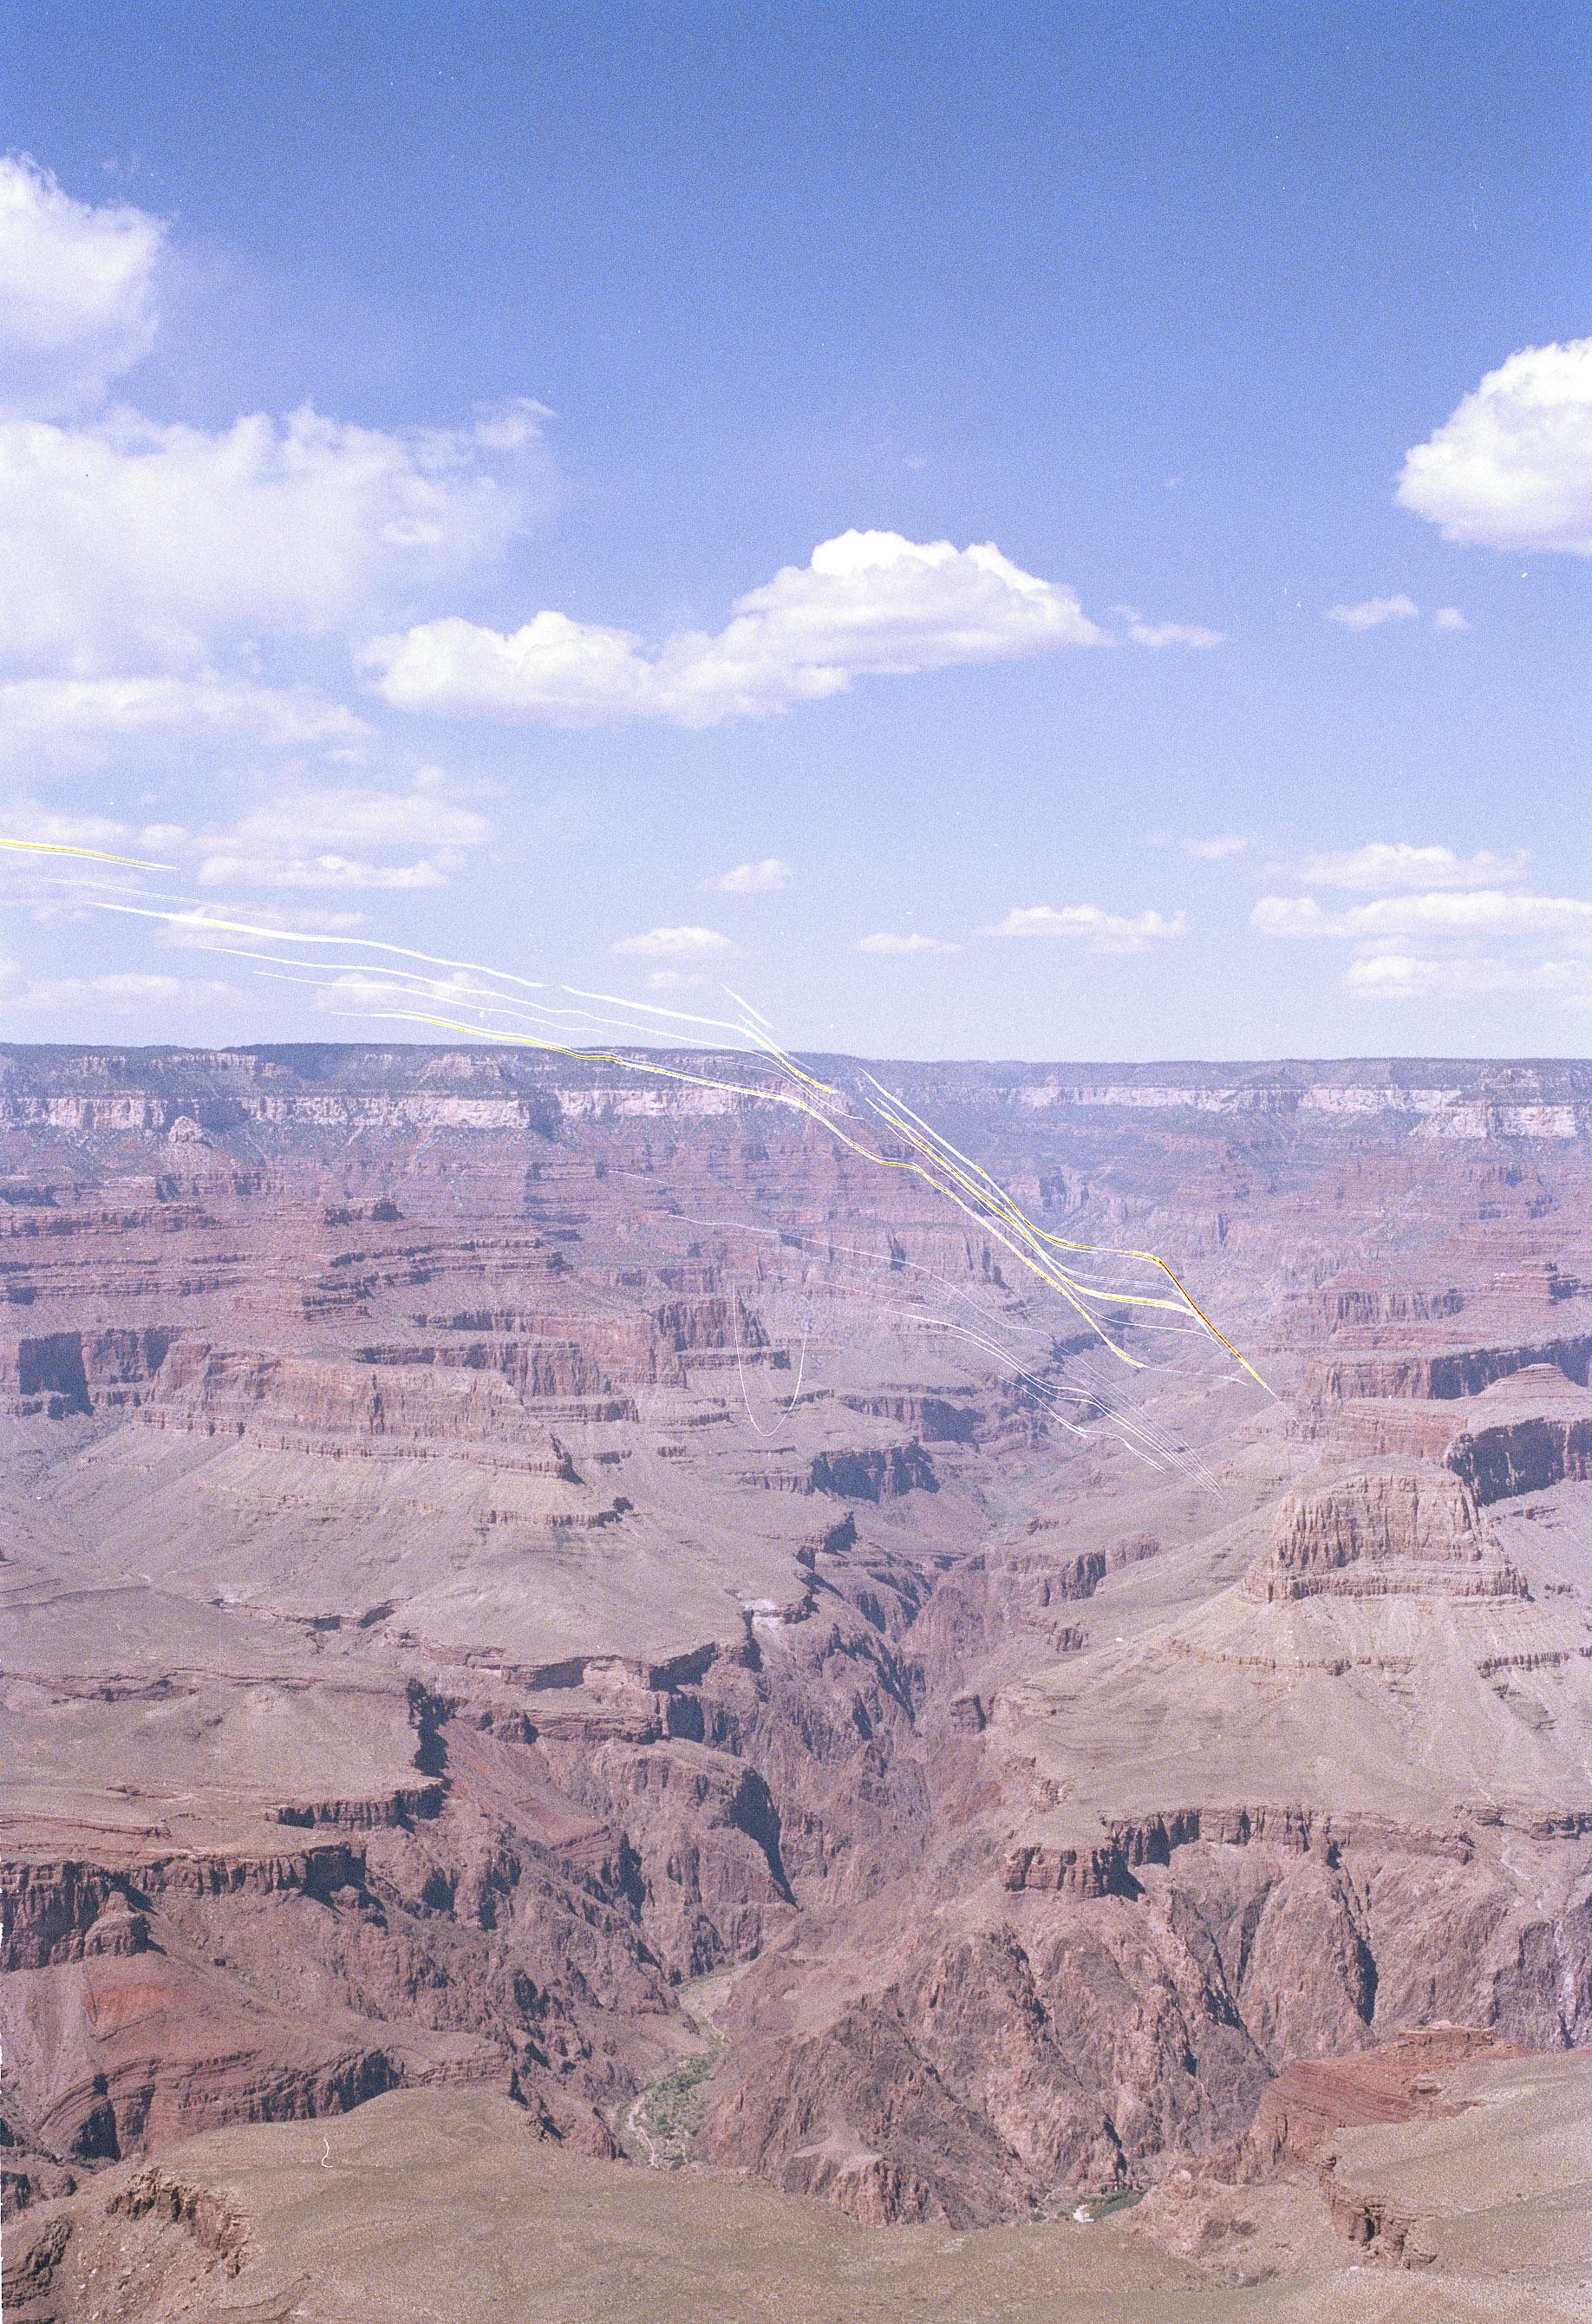 canyonscratch.jpg